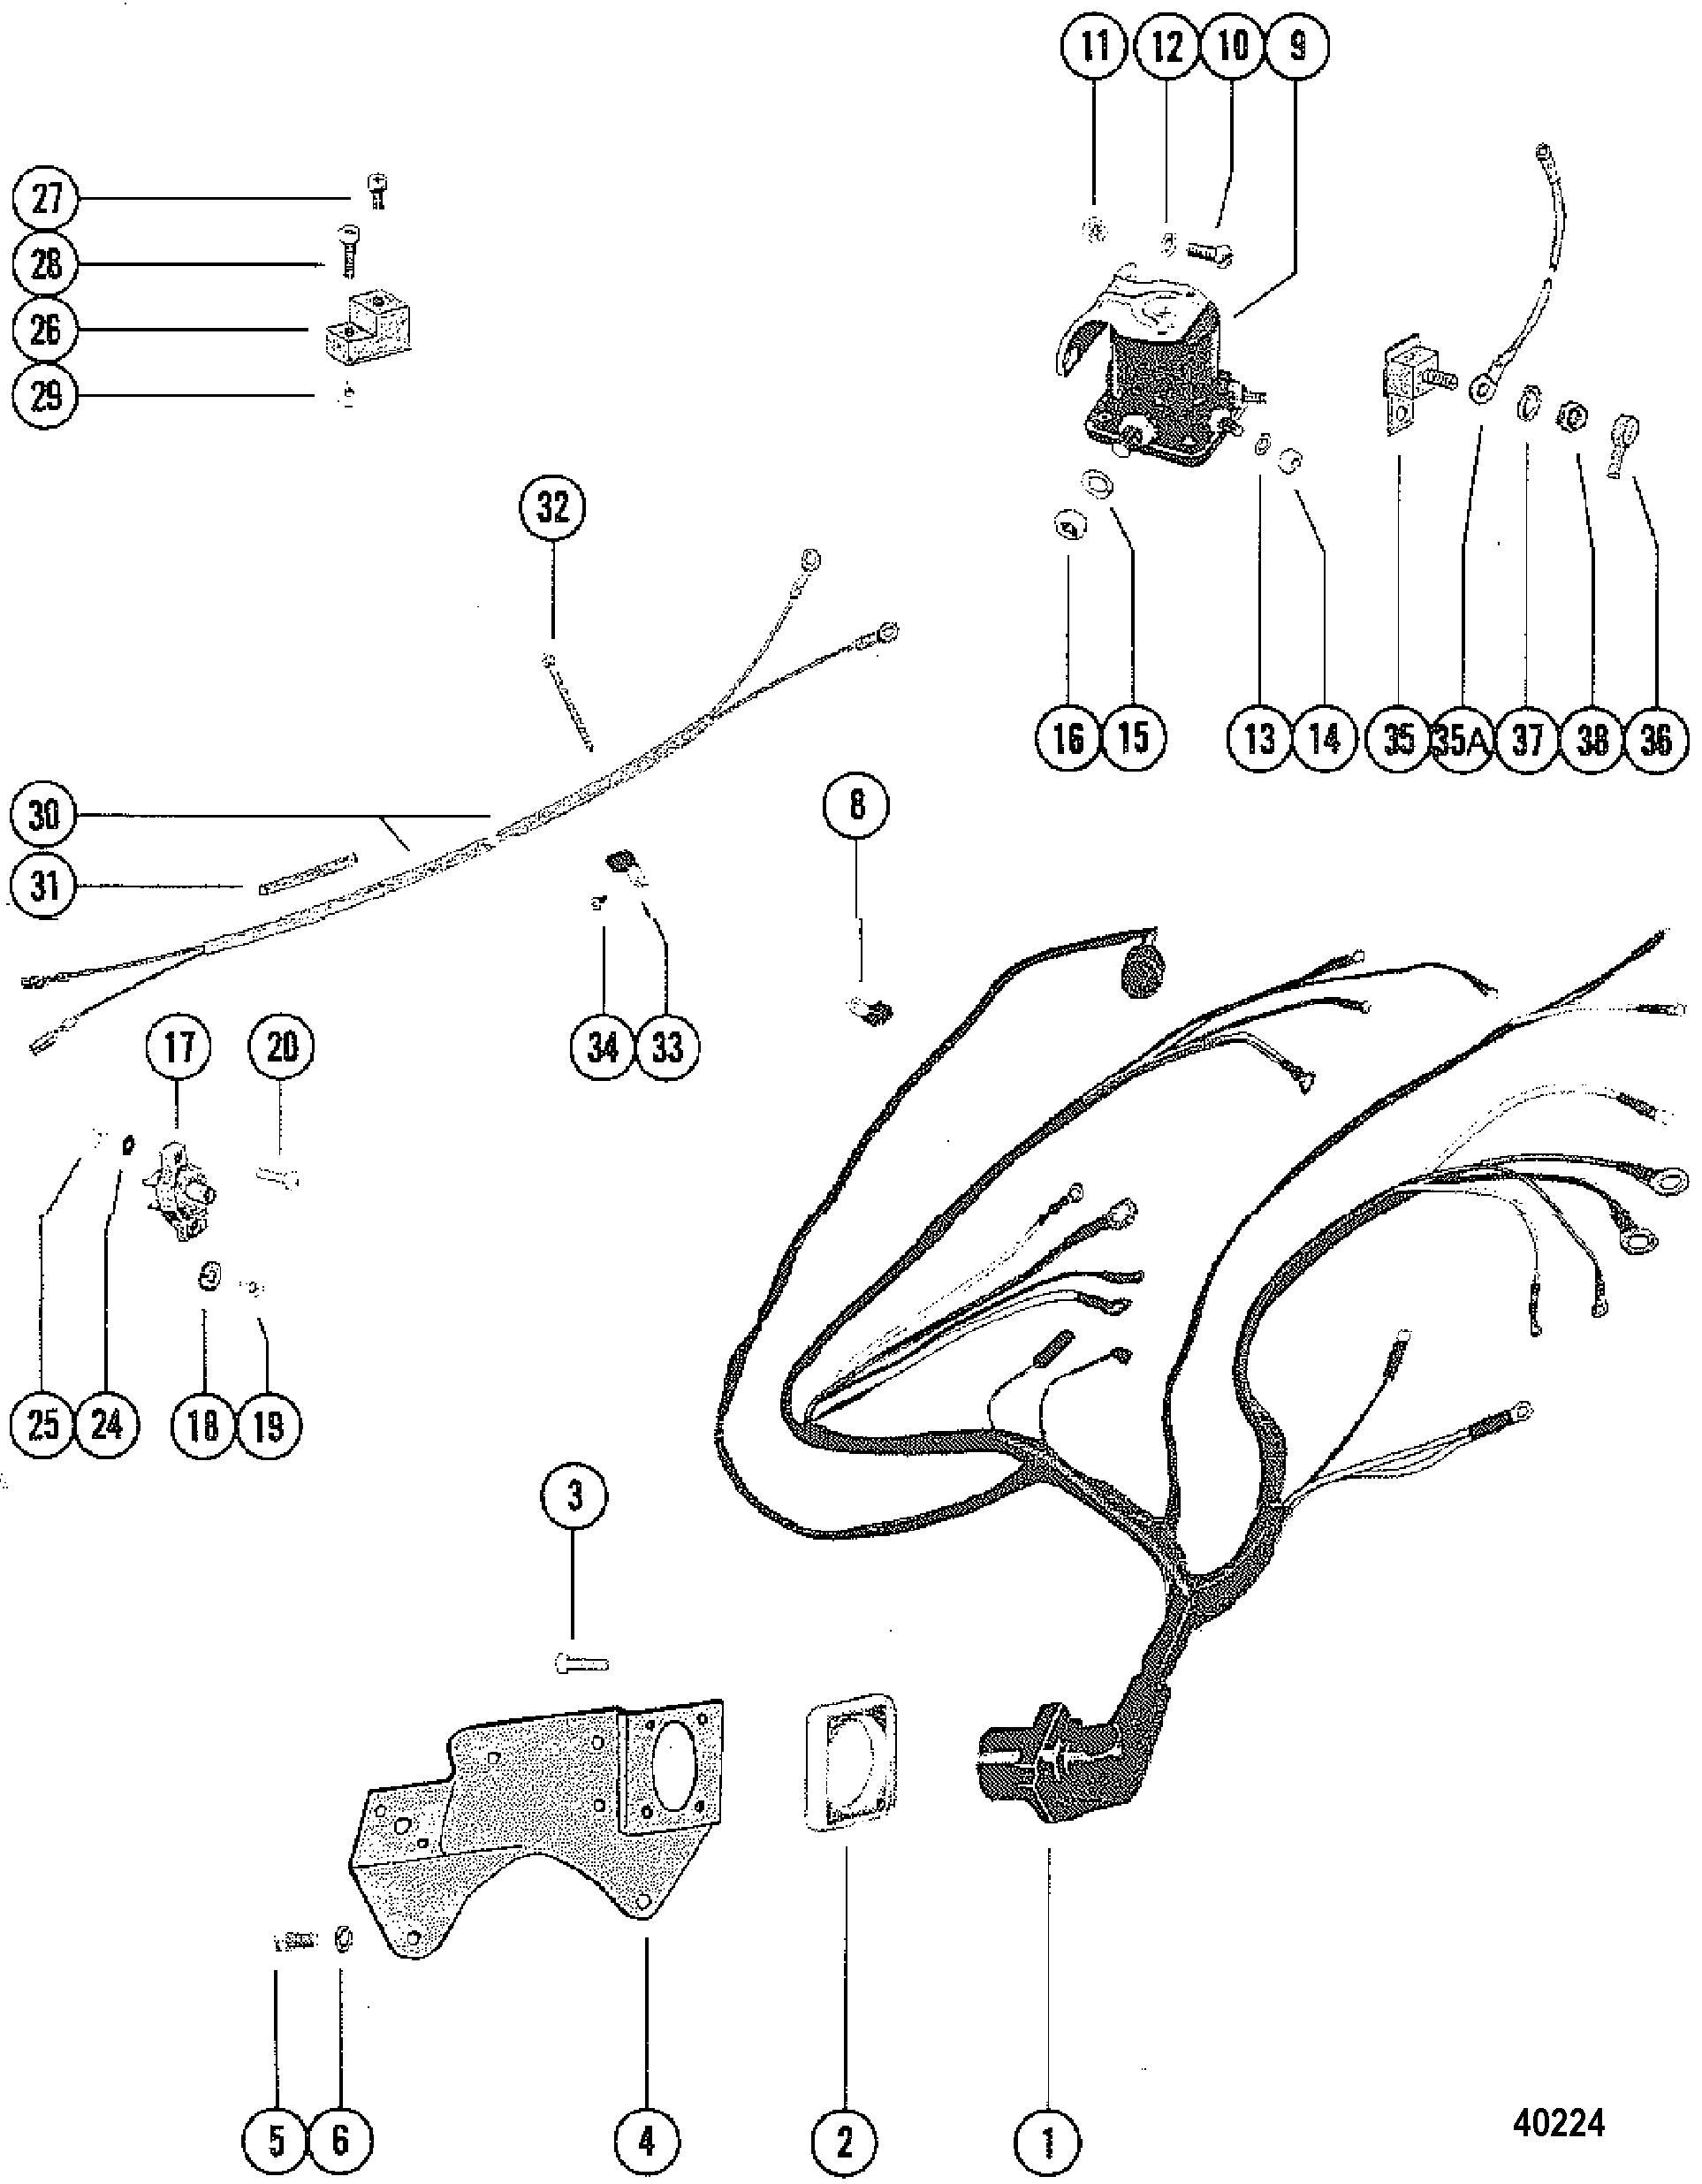 mercruiser 3 0 wiring diagram mg zr electric window engine harness 140 1979 get free image